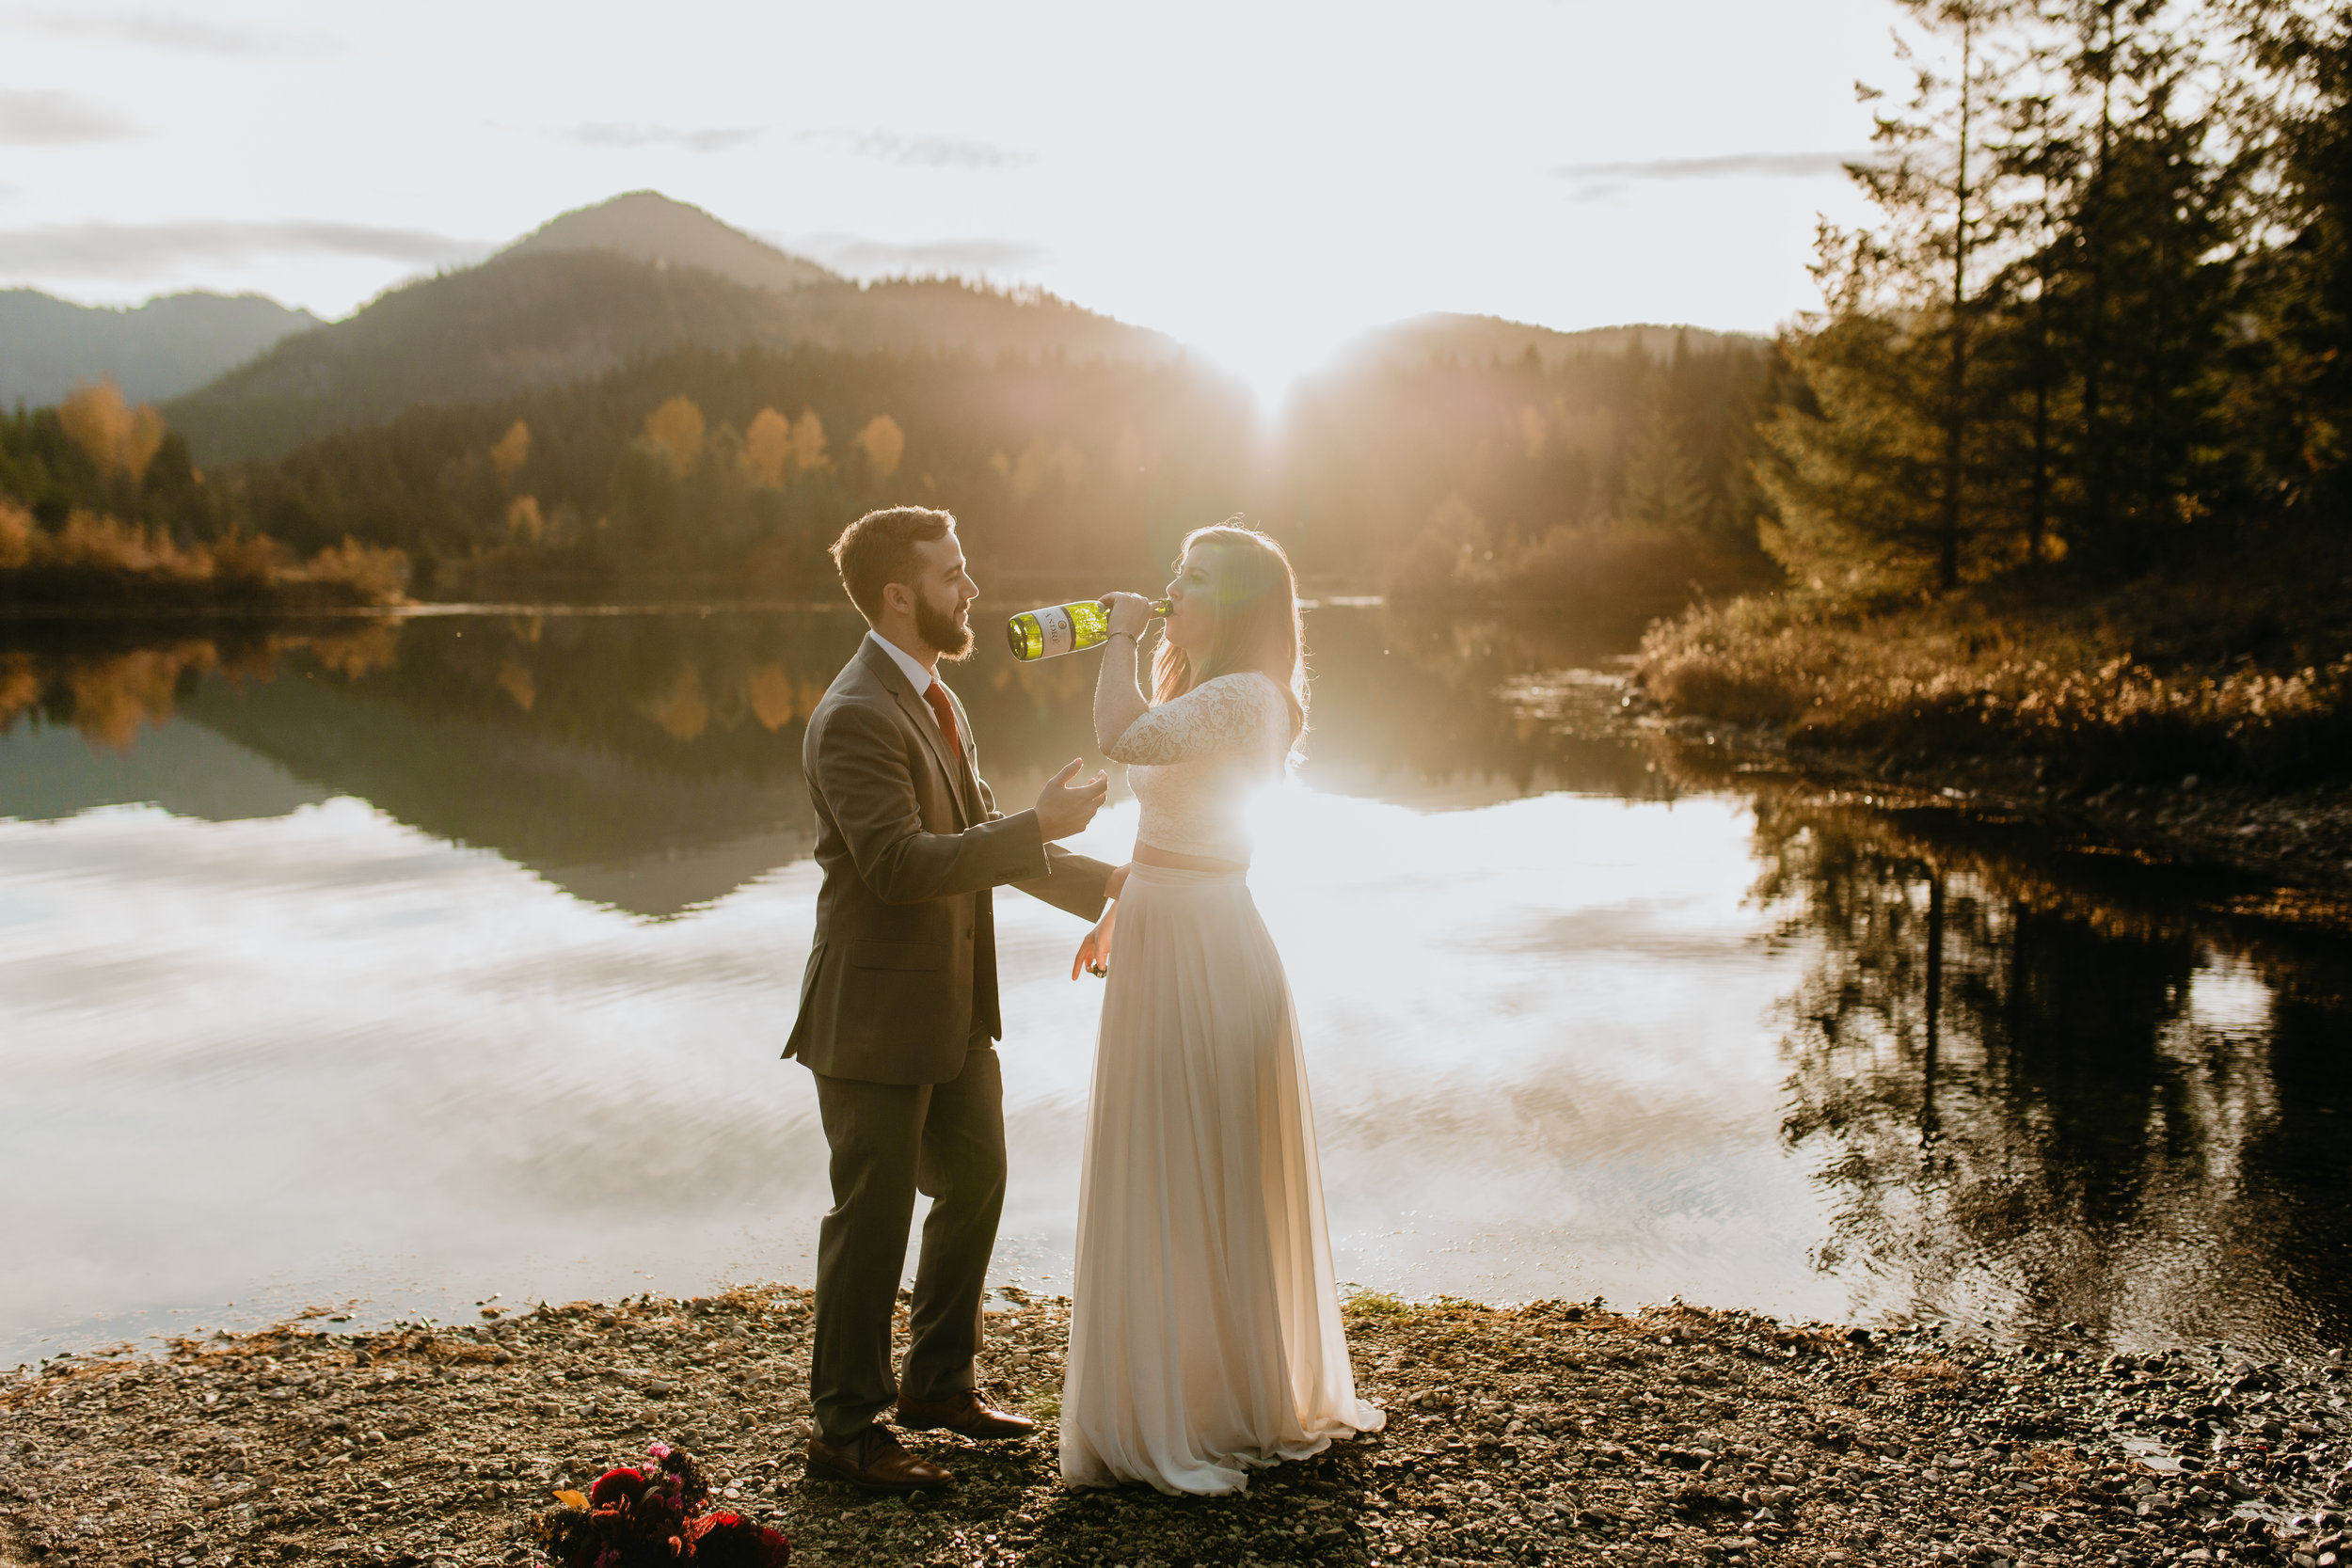 nicole-daacke-photography-mountain-view-elopement-at-gold-creek-pond-snoqualmie-washington-wa-elopement-photographer-photography-adventure-elopement-in-washington-fall-lakeside-golden-sunset-boho-fun-bride-0464.jpg